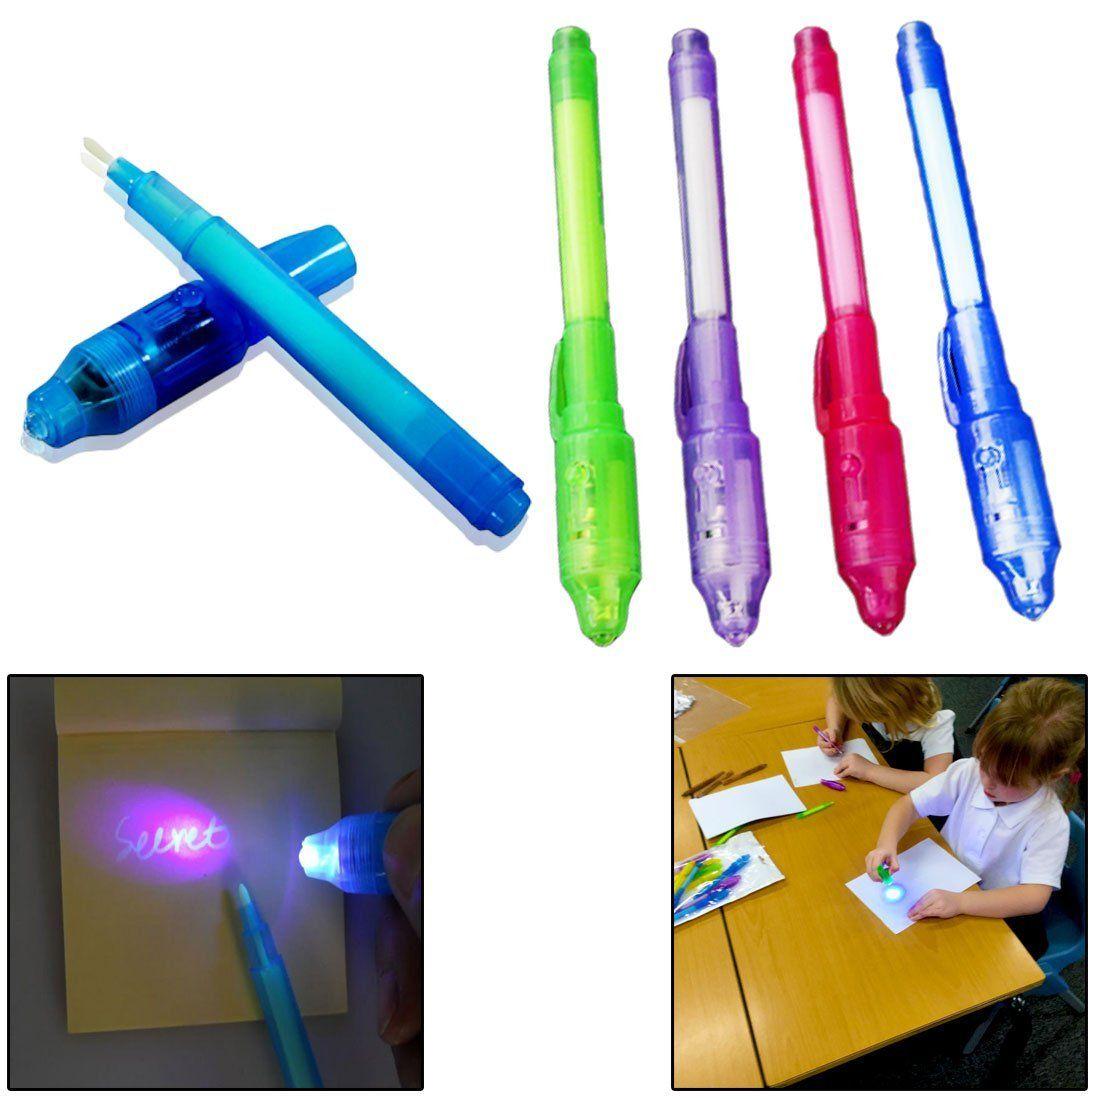 magic pen business proposal Magic pen business proposal essay academic writing service.